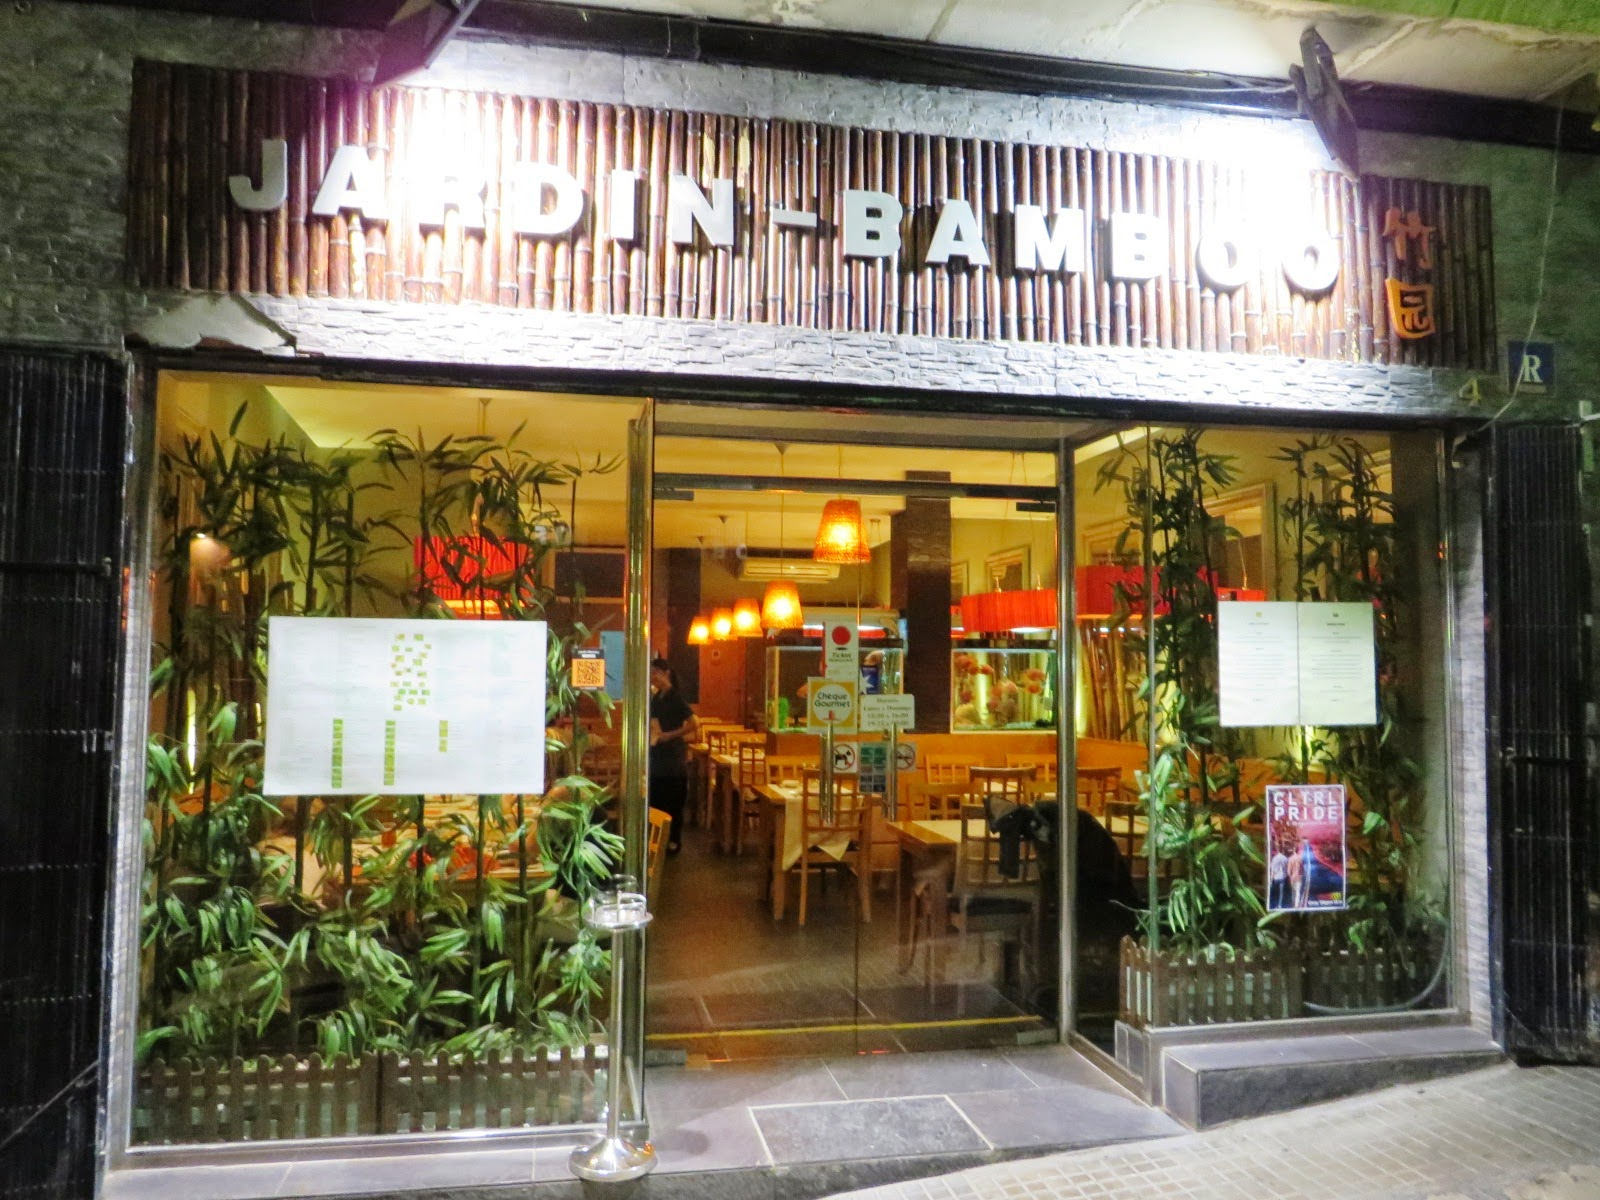 Urbina vinos blog restaurante asi tico jard n bamboo en for Restaurante el jardin pedraza